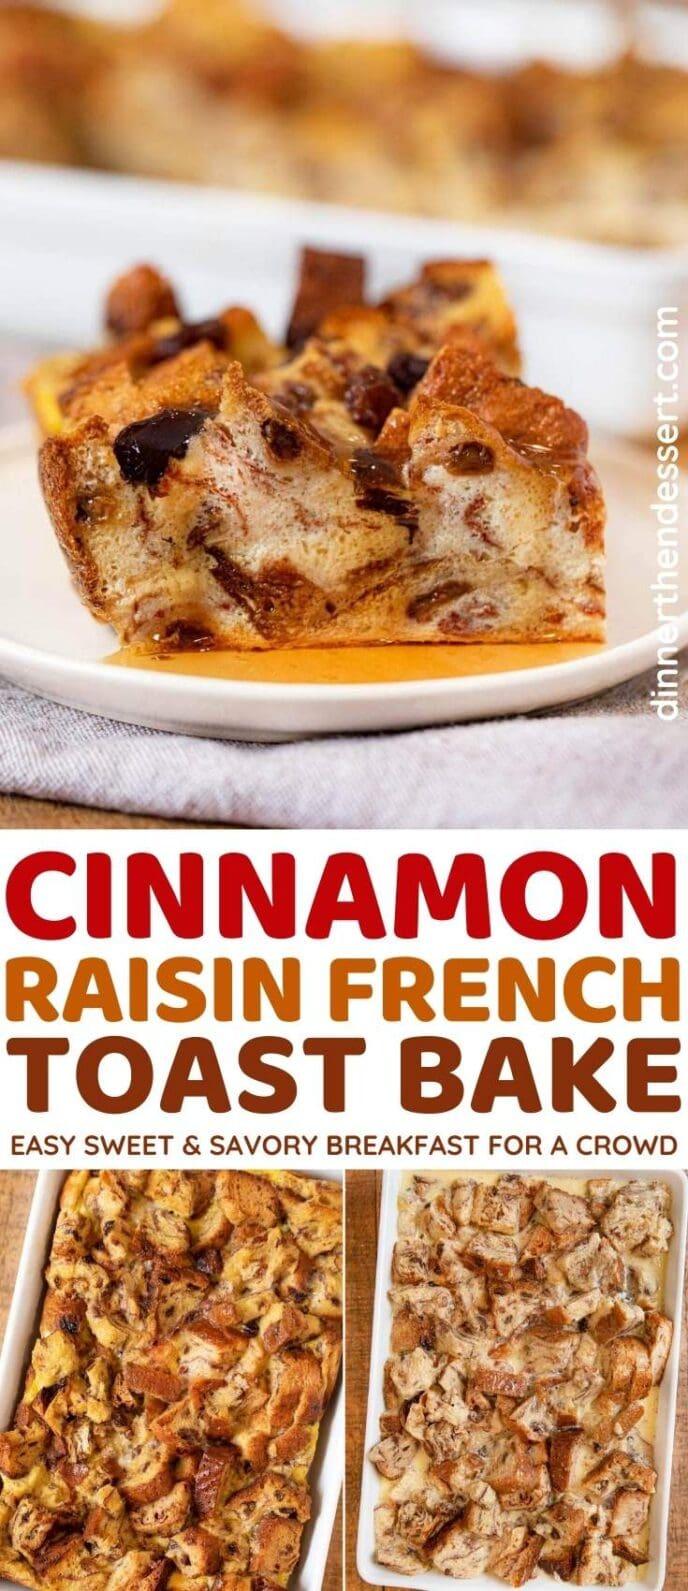 Cinnamon Raisin French Toast Bake collage